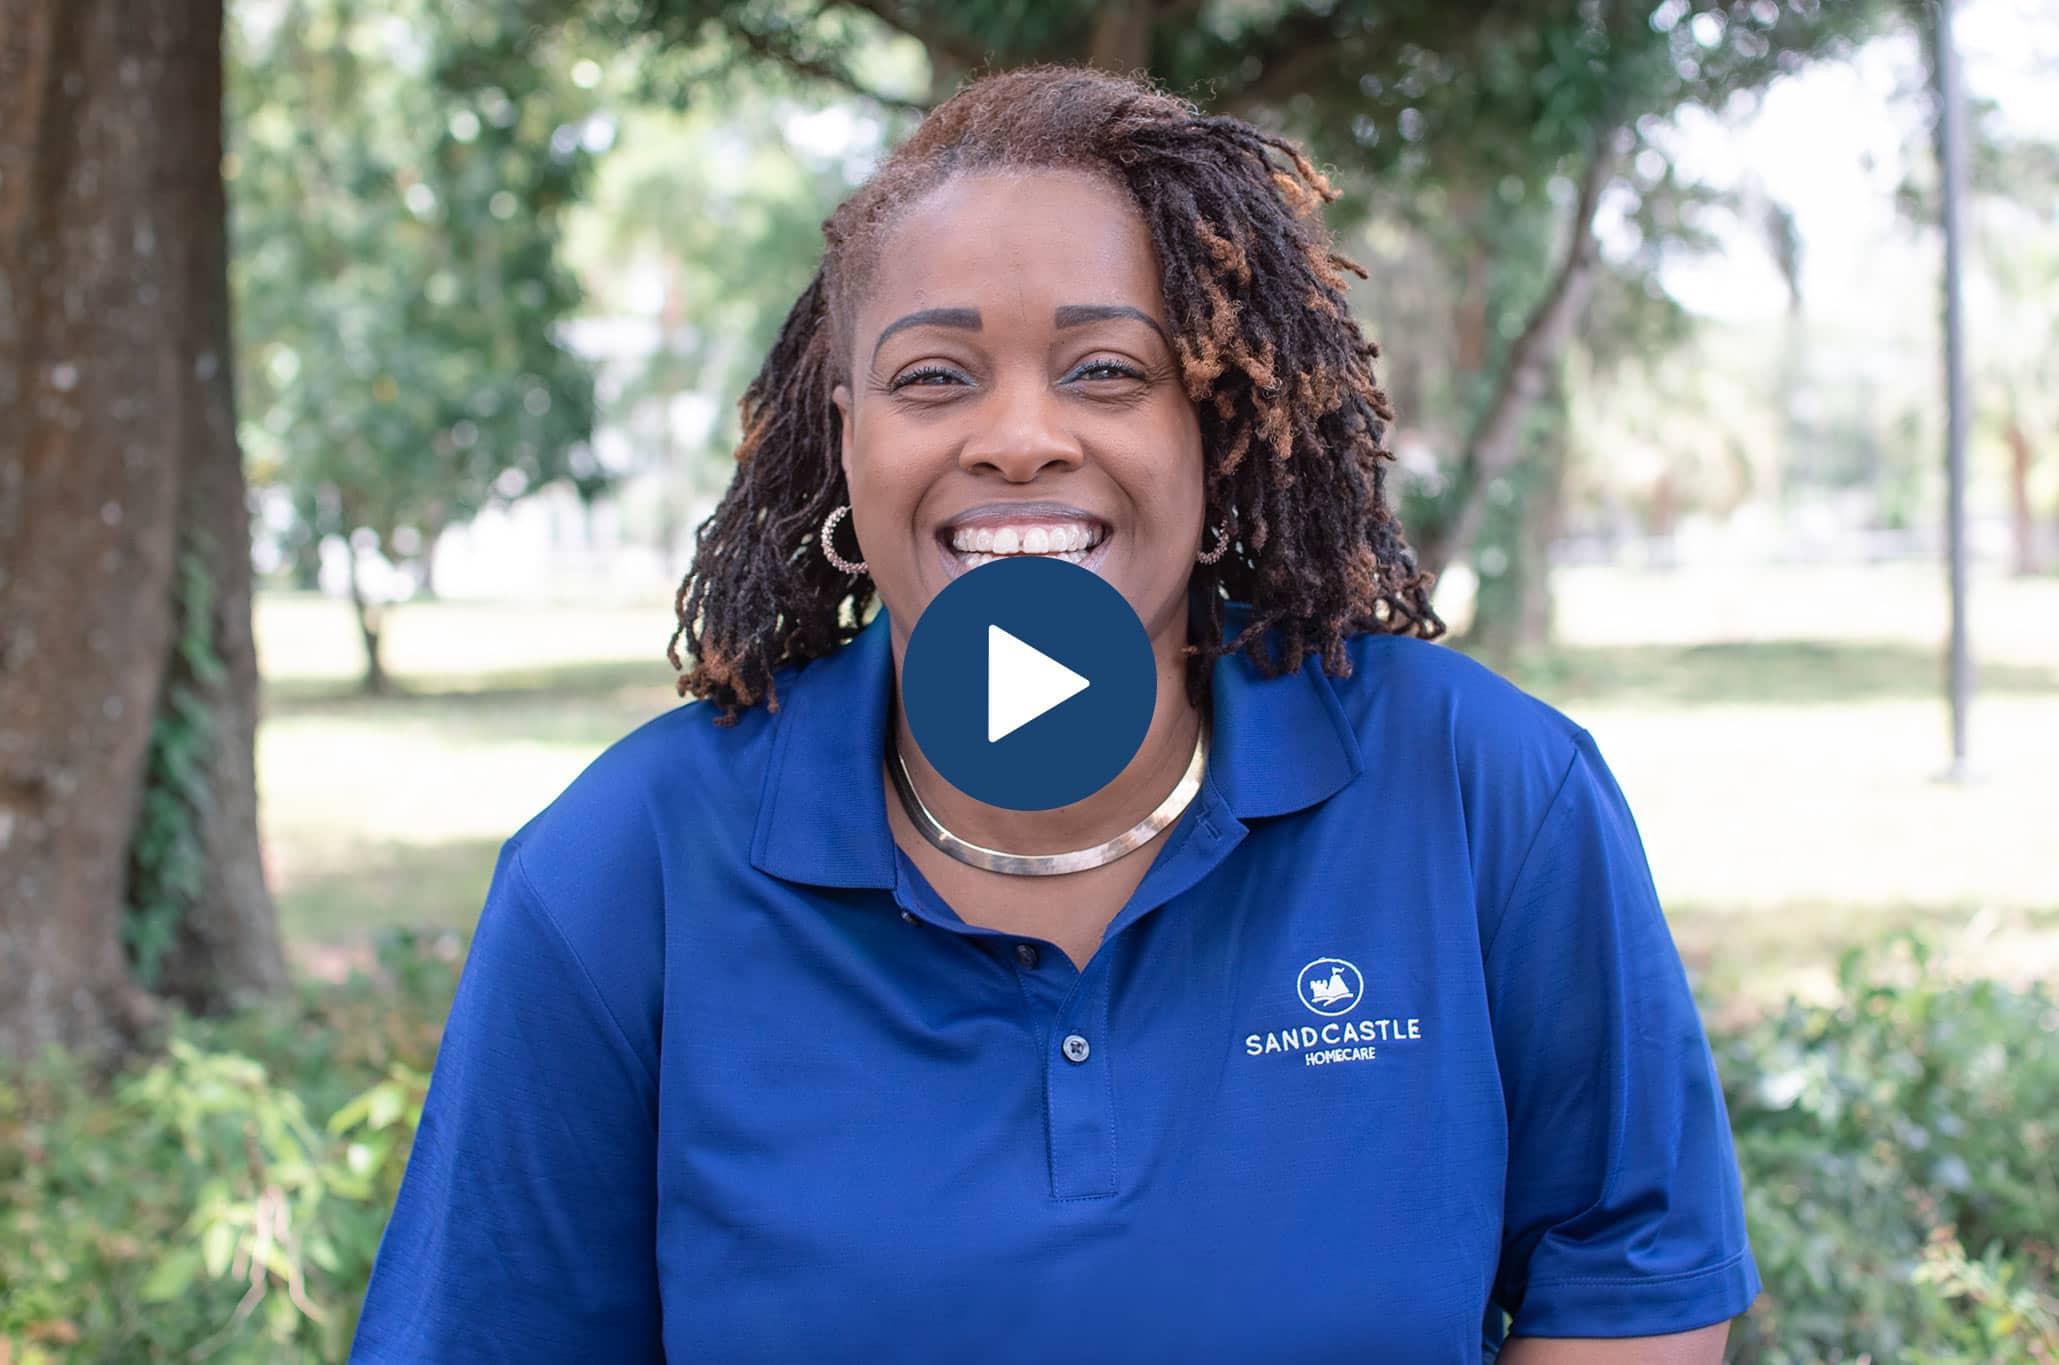 Caregiver Video - Sandcastle Homecare